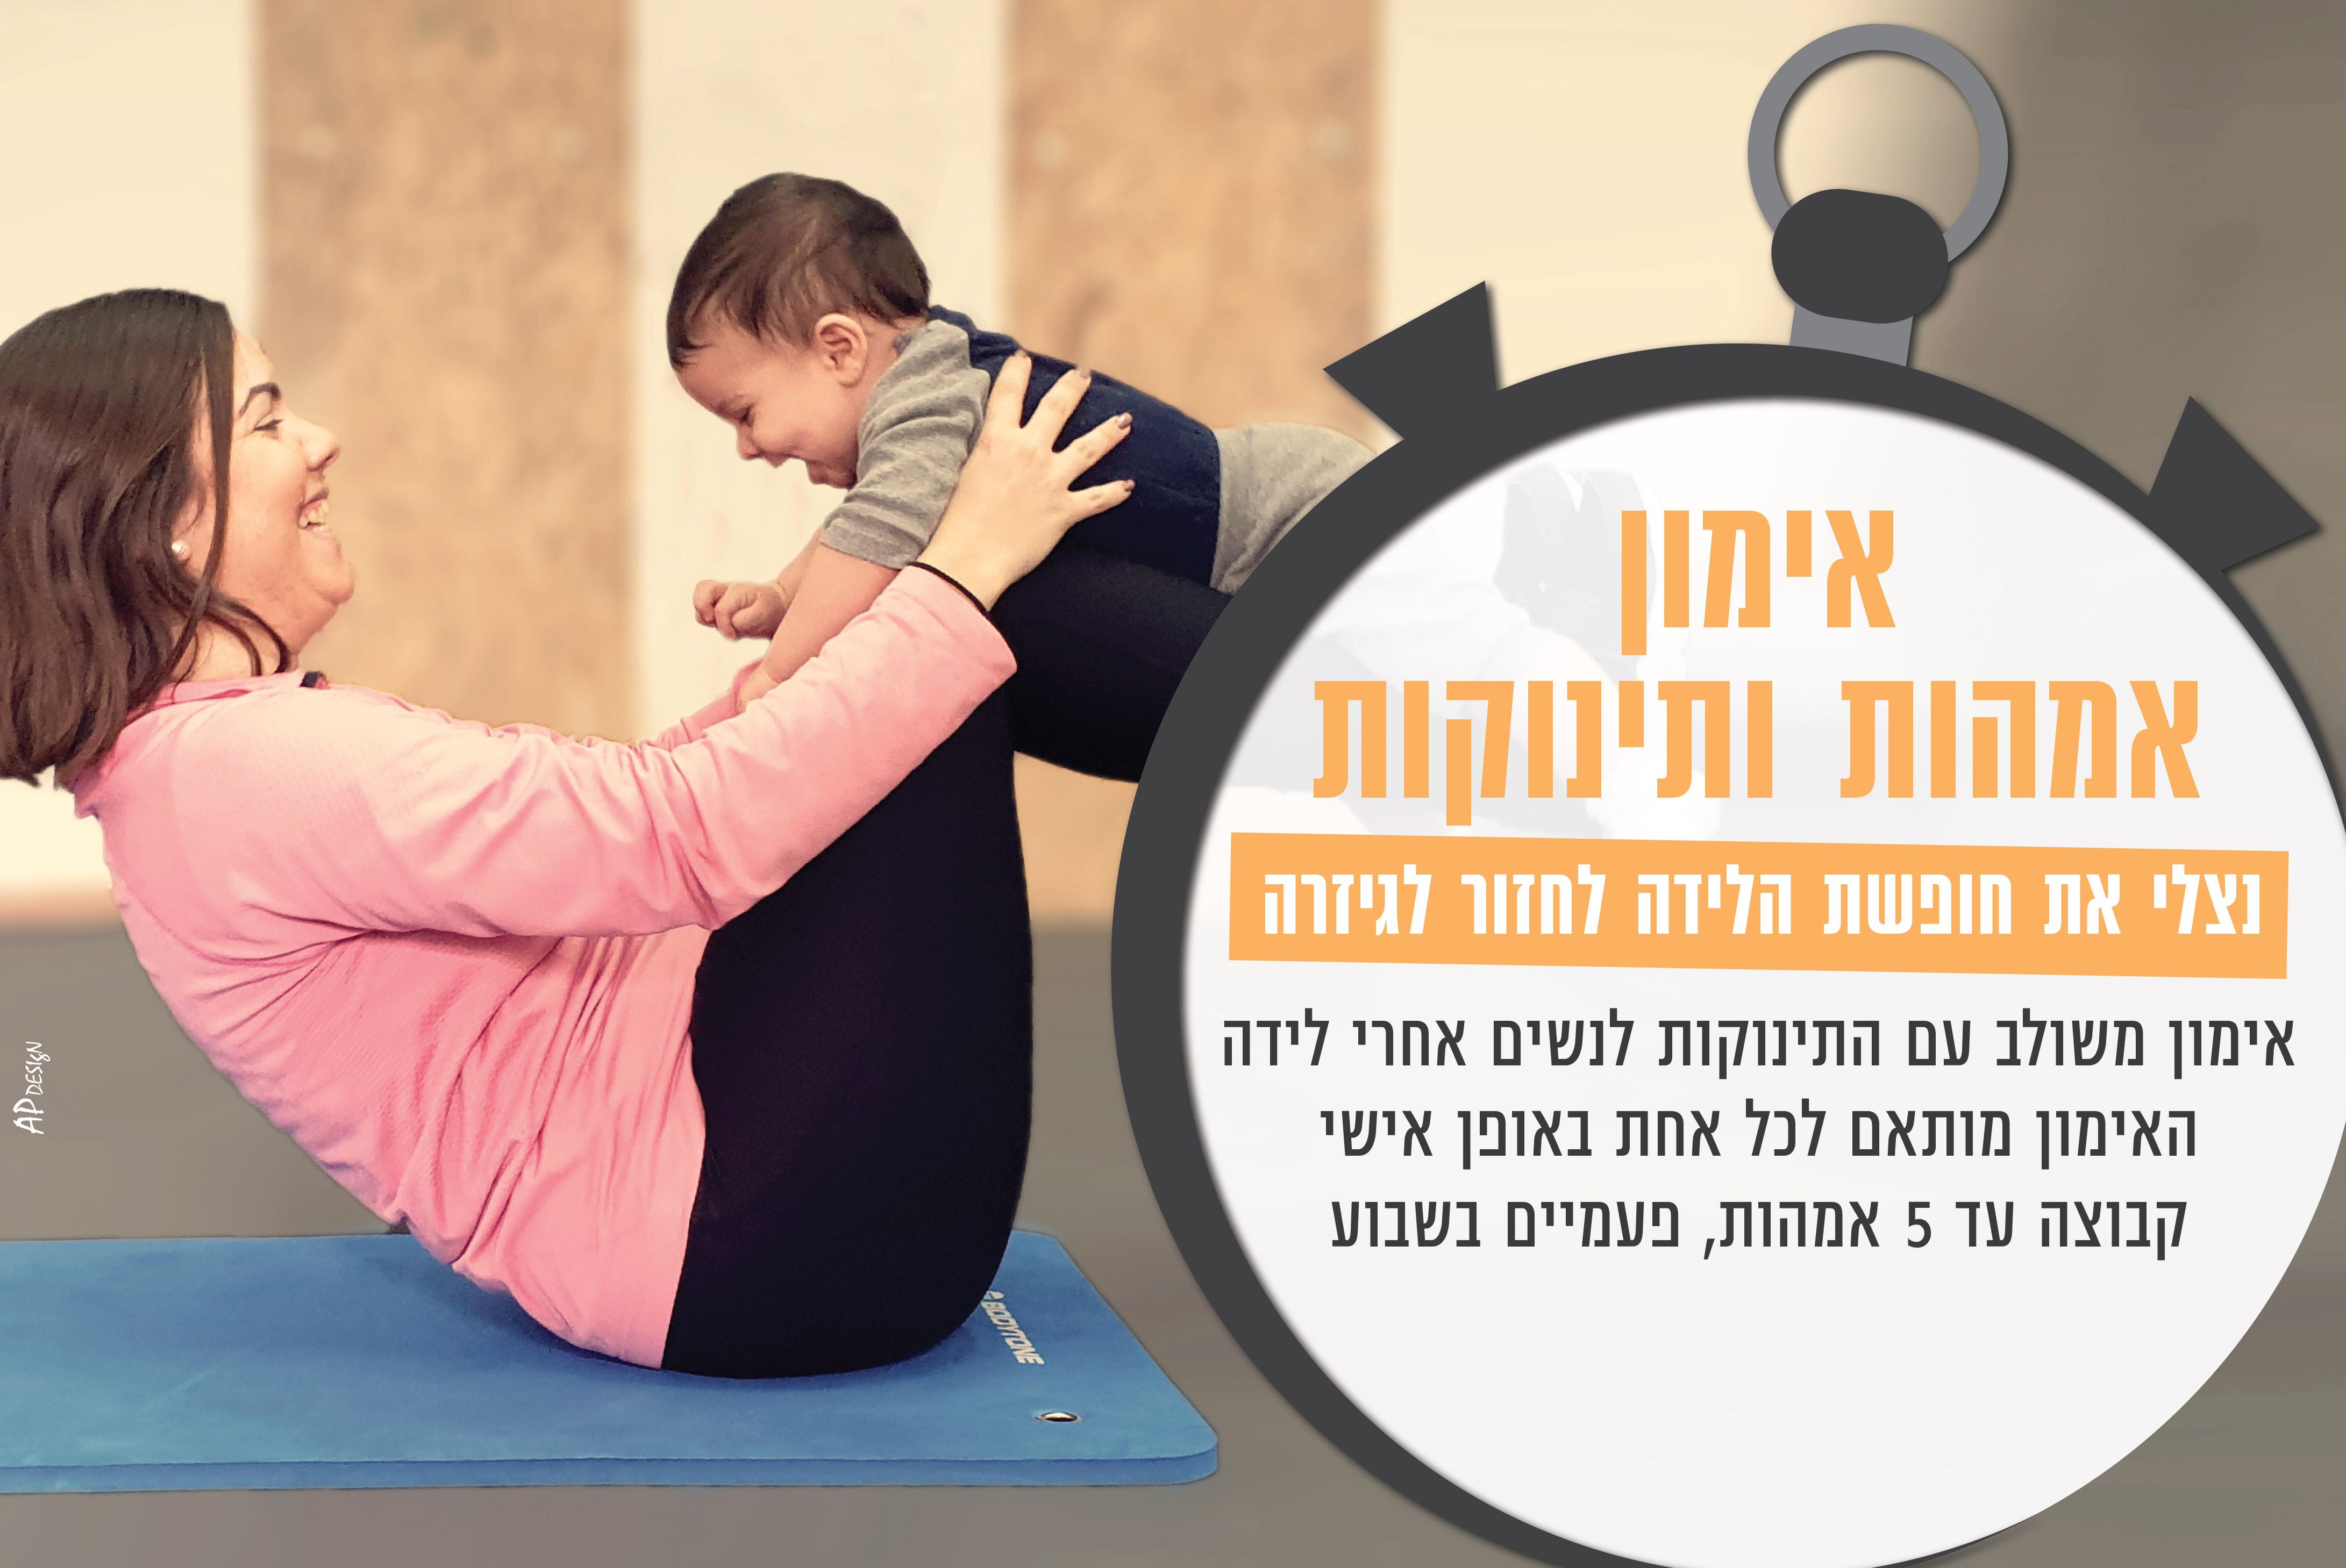 FOR LIFE פוסט אימהות ותינוקות-01